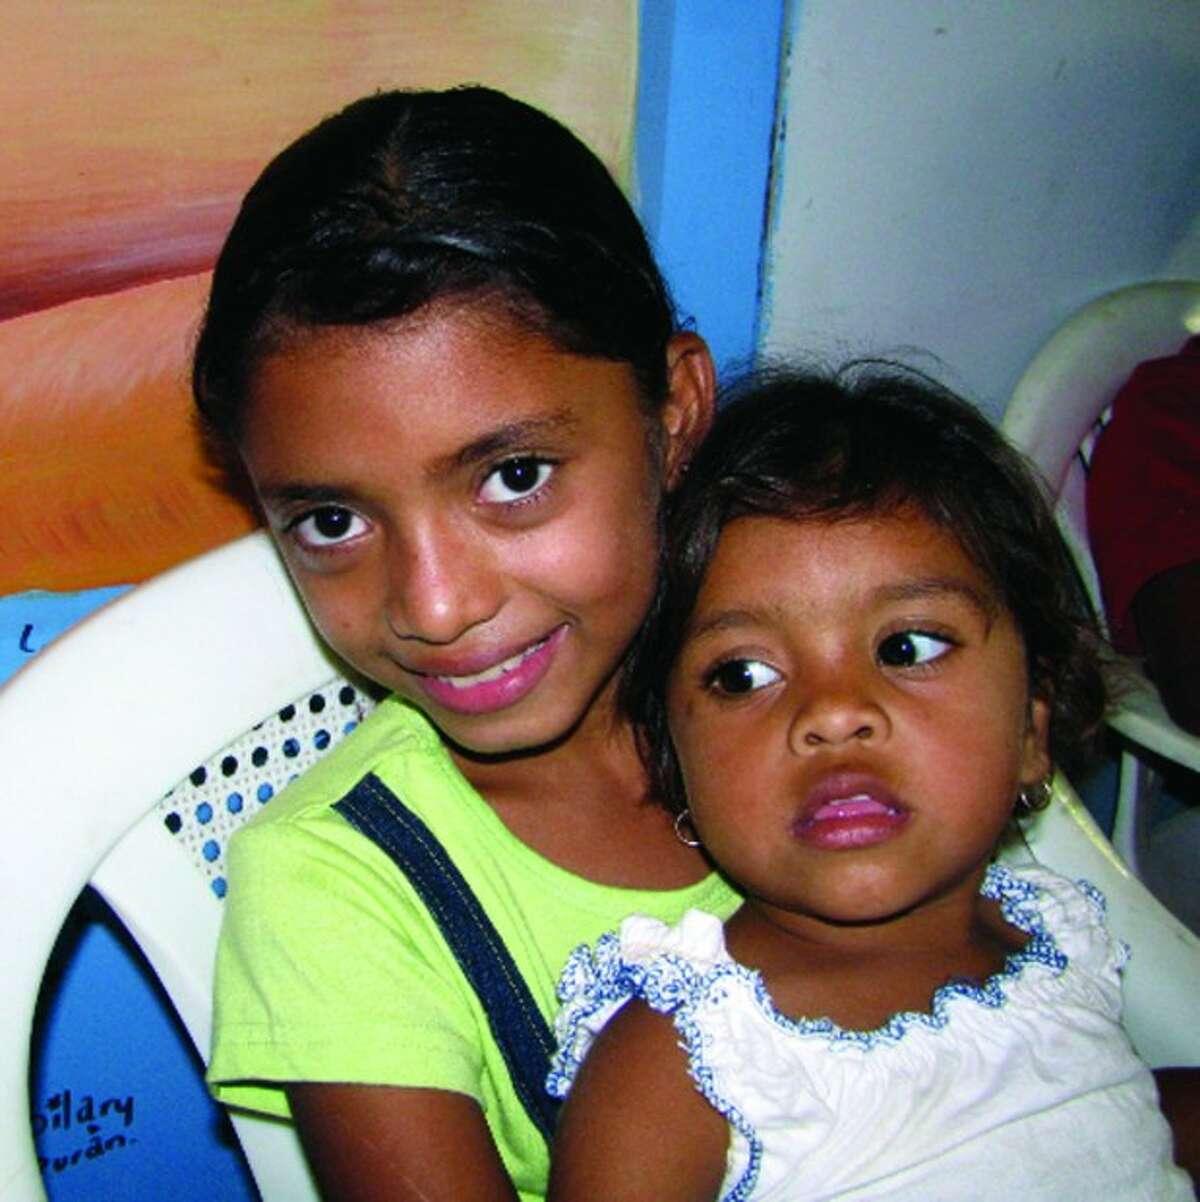 Sister-city partnership between Norwalk and Nagarote, Nicaragua, grew in 'stunning ways'